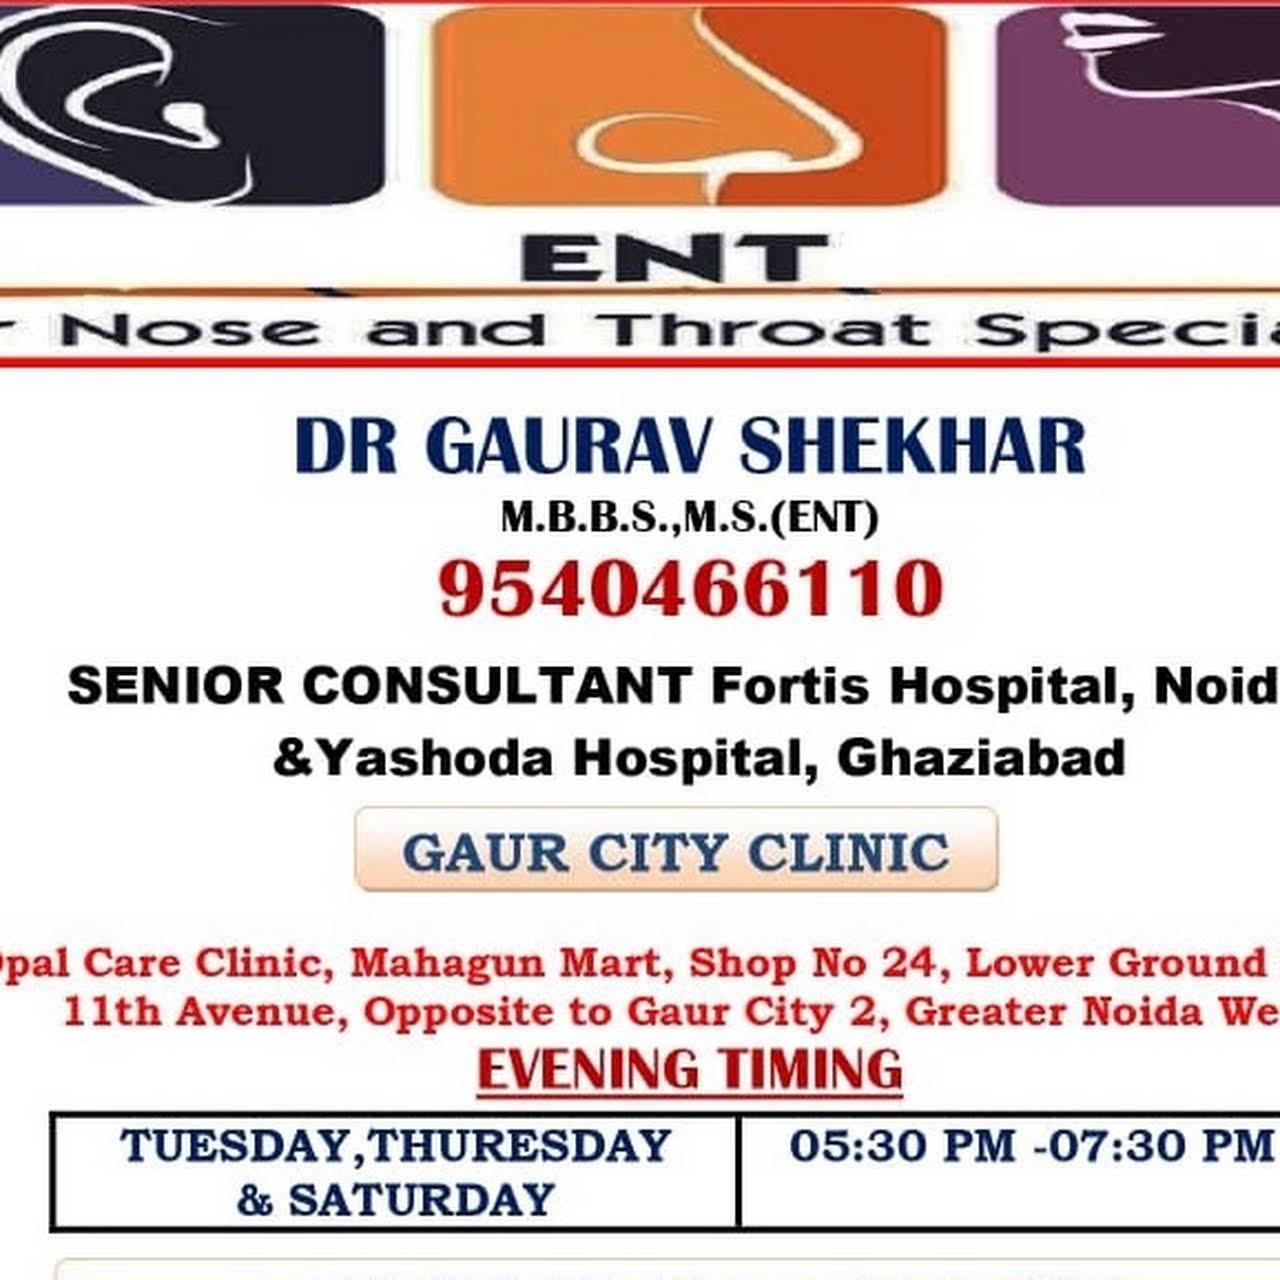 Dr Gaurav Shekhar's ENT Clinic In Gaur City